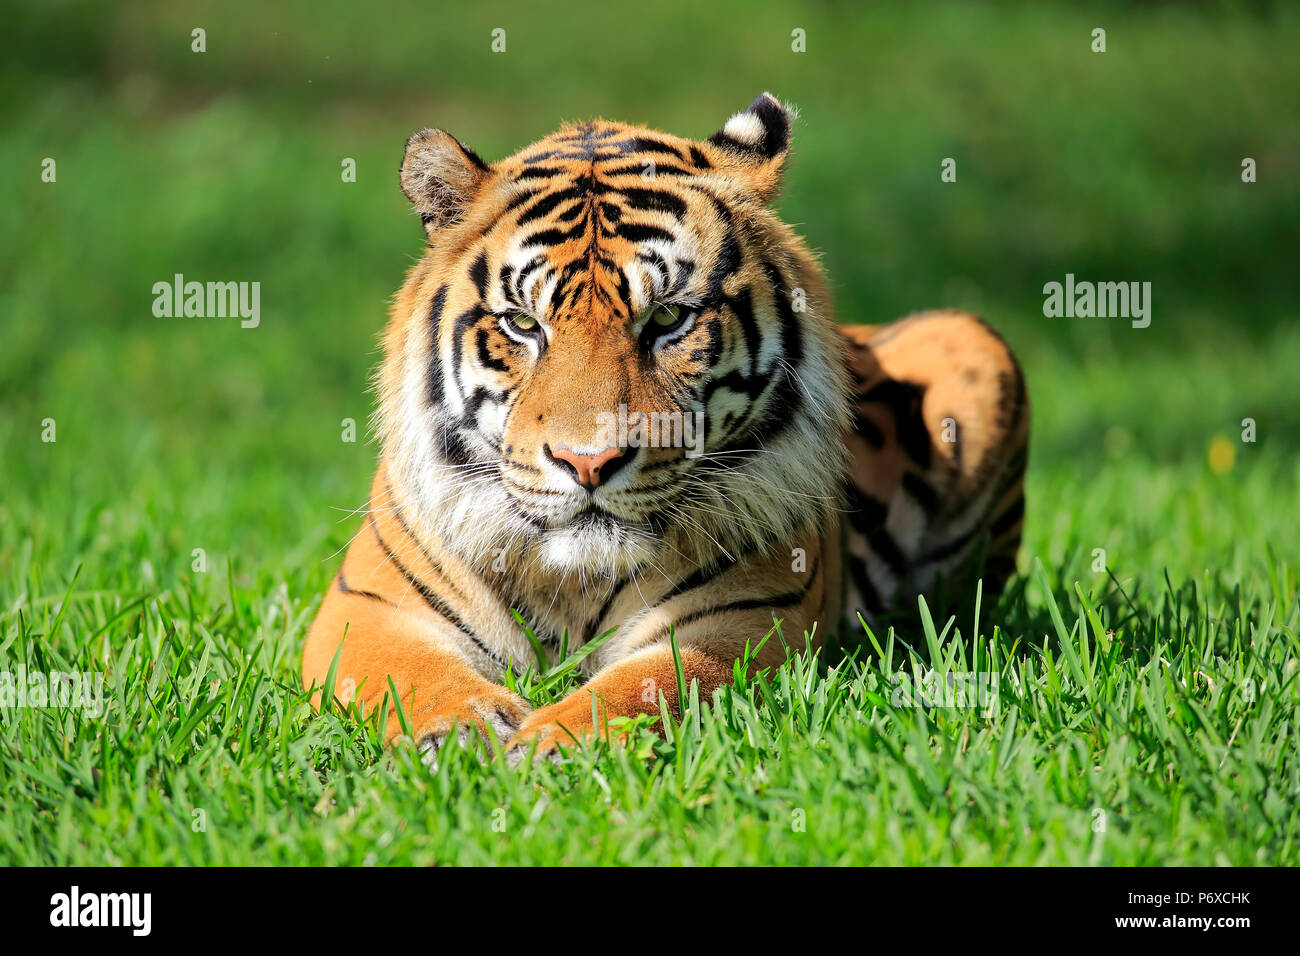 La tigre di Sumatra, maschio adulto, Sumatra, Asia, Panthera tigris sumatrae Immagini Stock